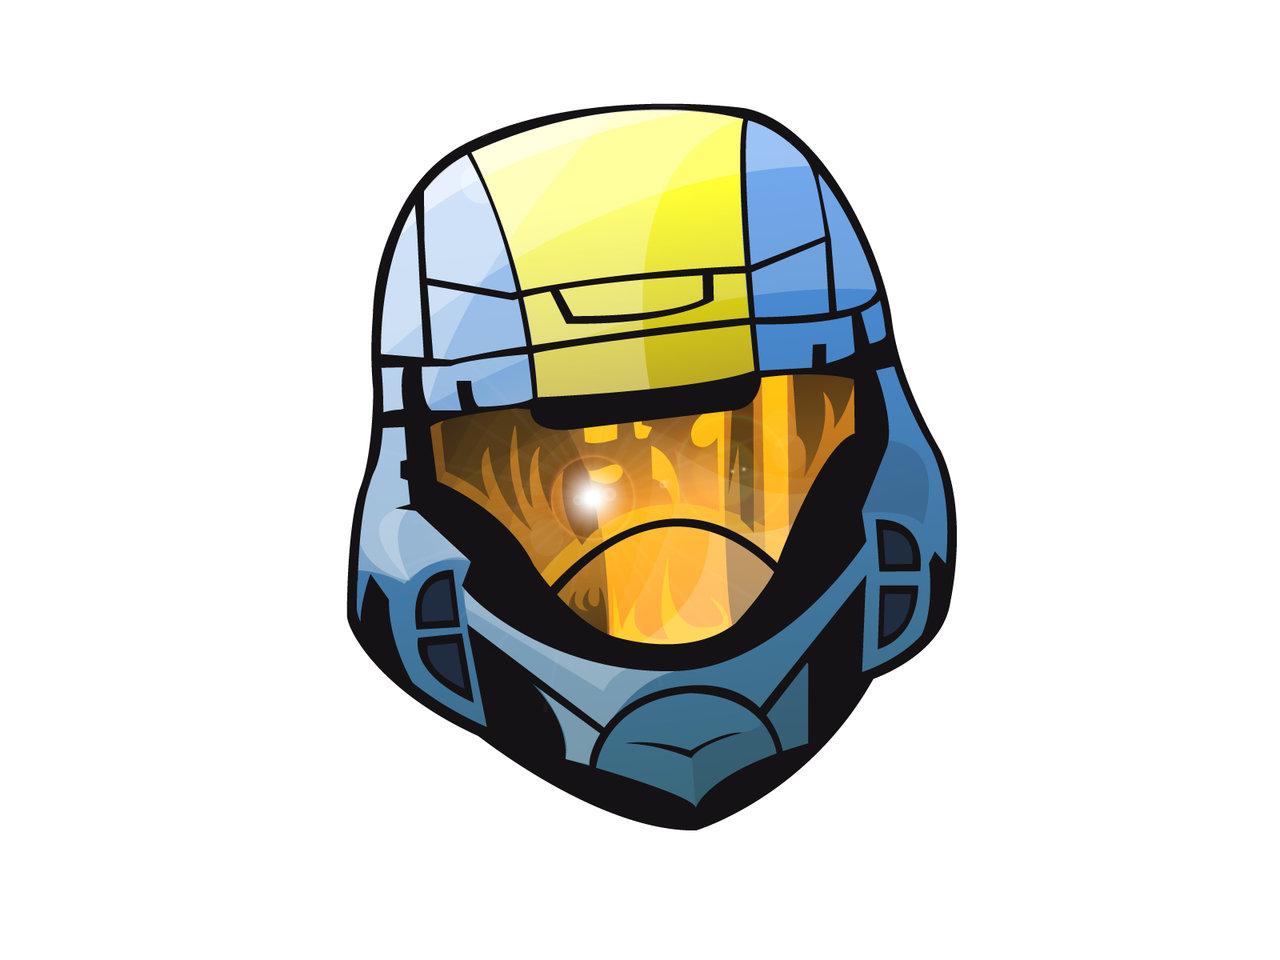 Halo clipart helmet Helmet by DeviantArt ODST helmet